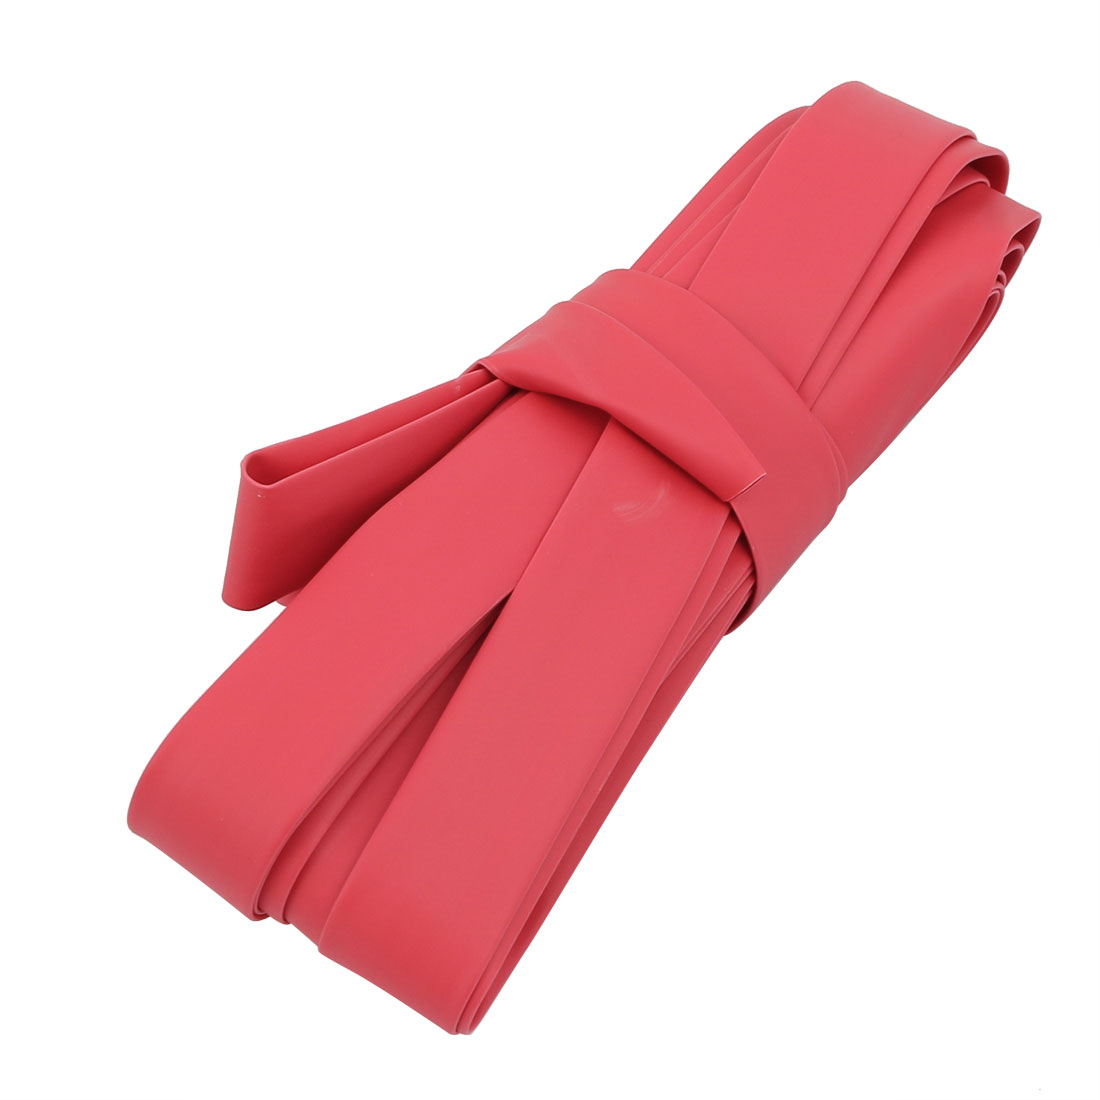 5M Long 10mm Inner Dia. Polyolefin Heat Shrinkable Tube Red for Wire Repairing